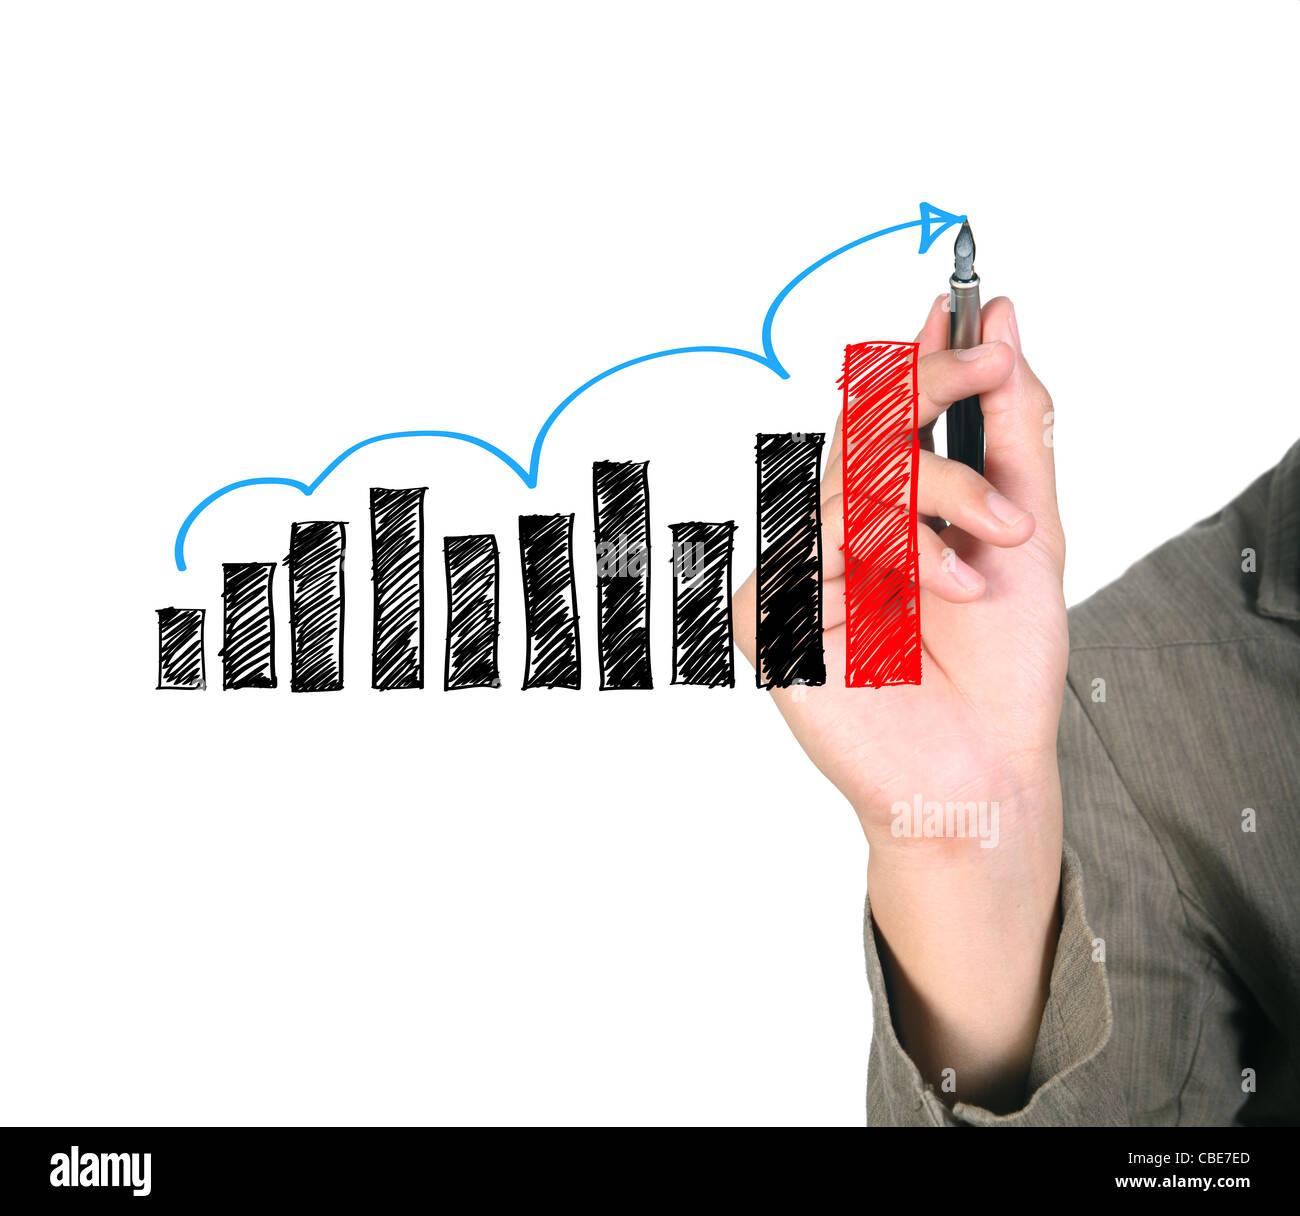 Hombre de negocios de dibujo a mano alzada flecha azul hacia arriba gráficos Imagen De Stock